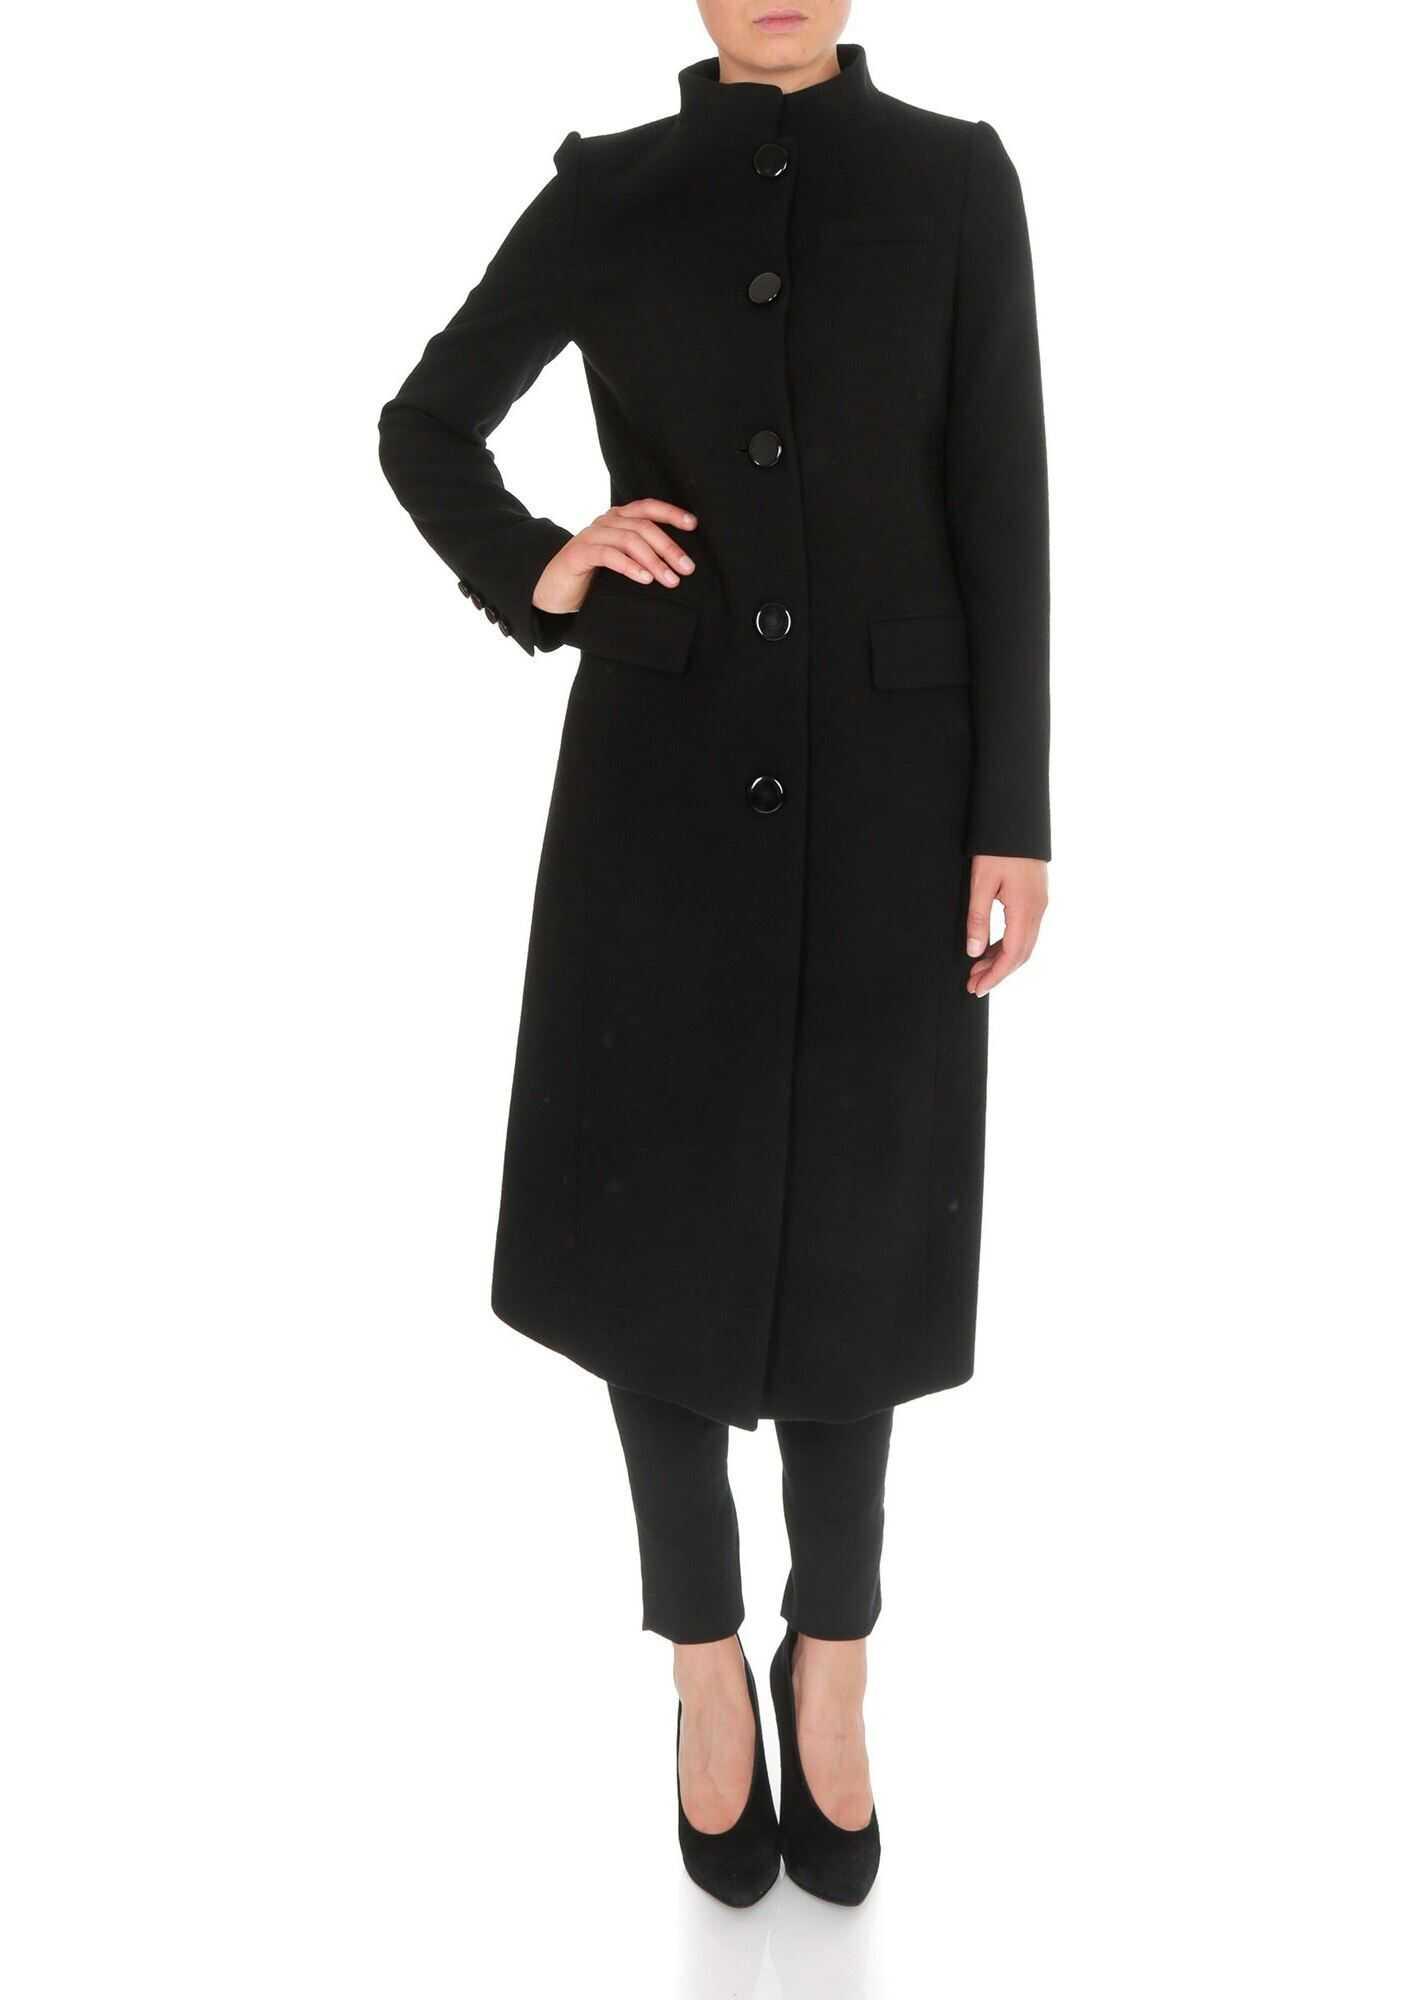 Givenchy Black Wool Coat With Mandarin Collar Black